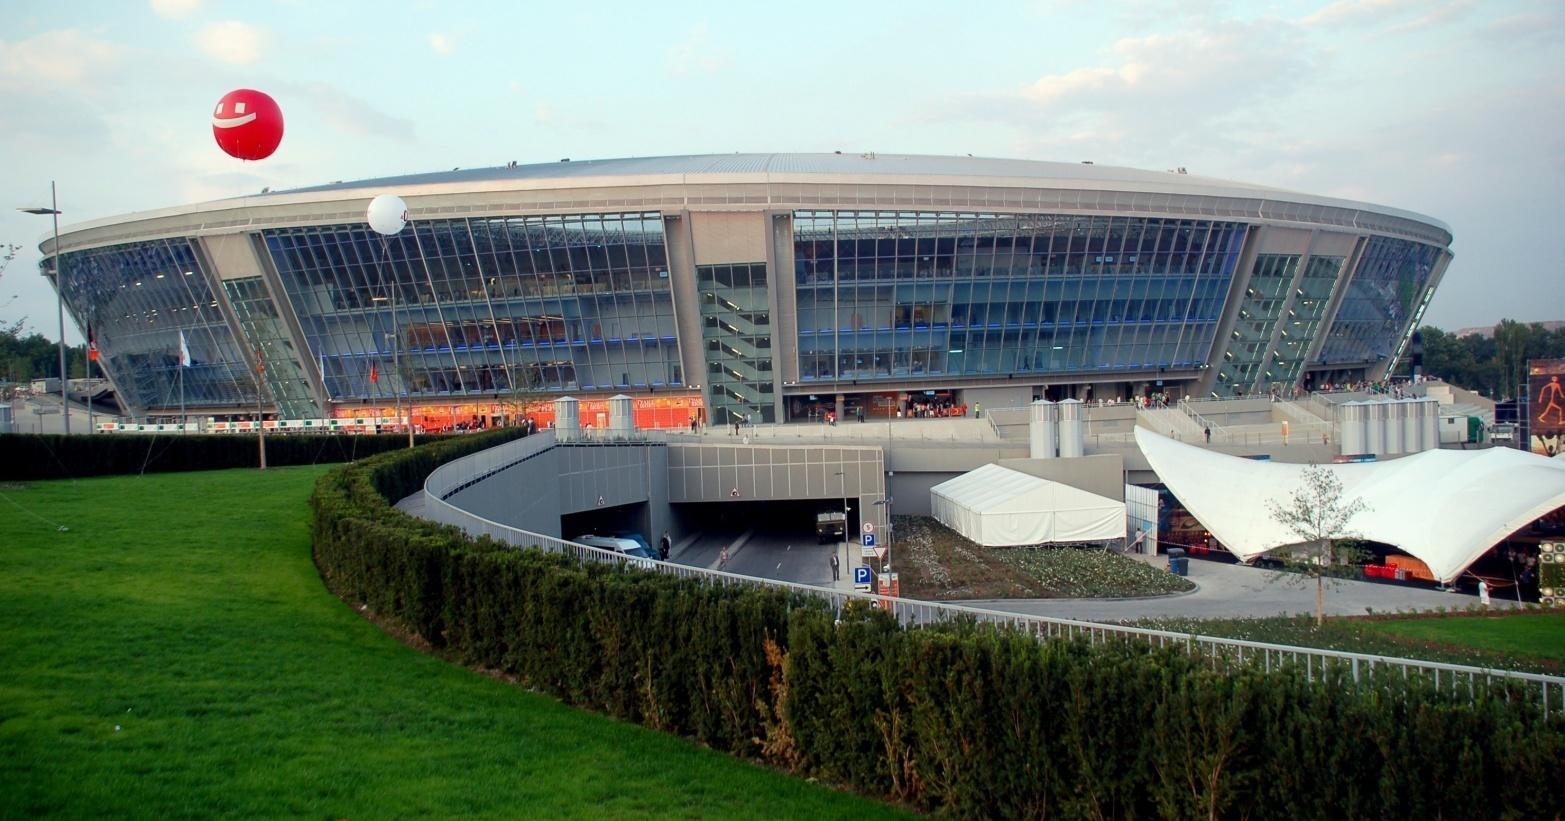 https://upload.wikimedia.org/wikipedia/ru/archive/1/1c/20090901075612!Donbass_Arena_open.jpg